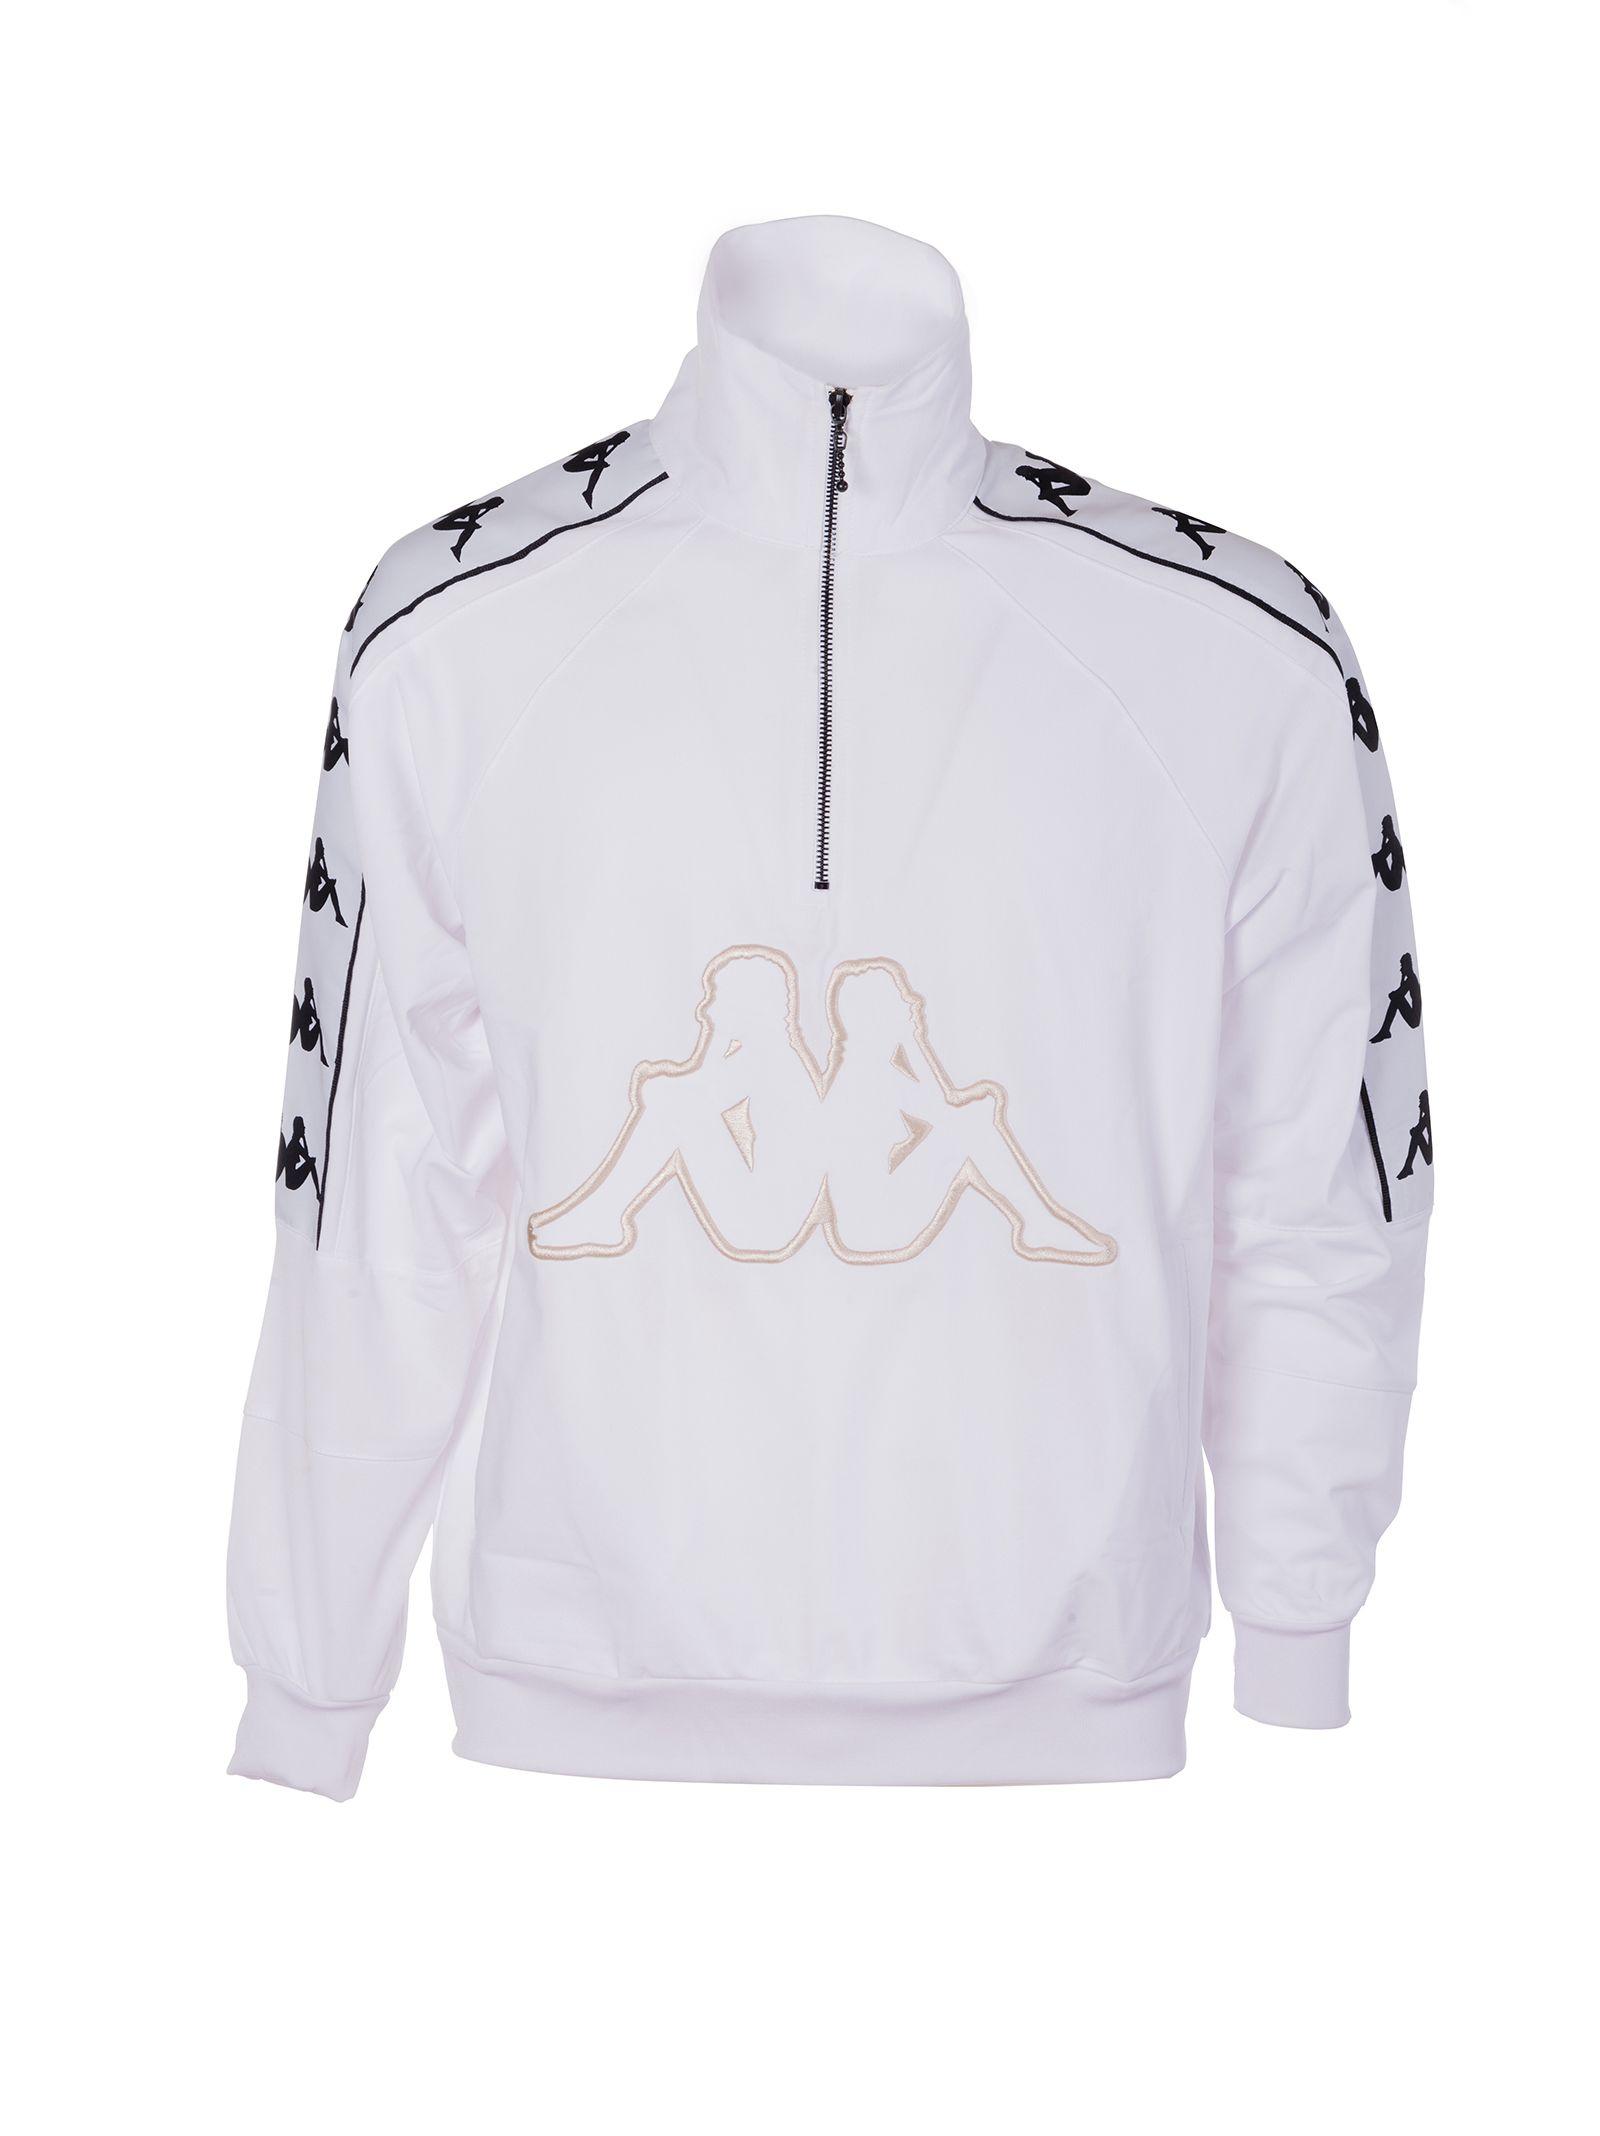 Kappa Kappa Banda Half Zip Jacket